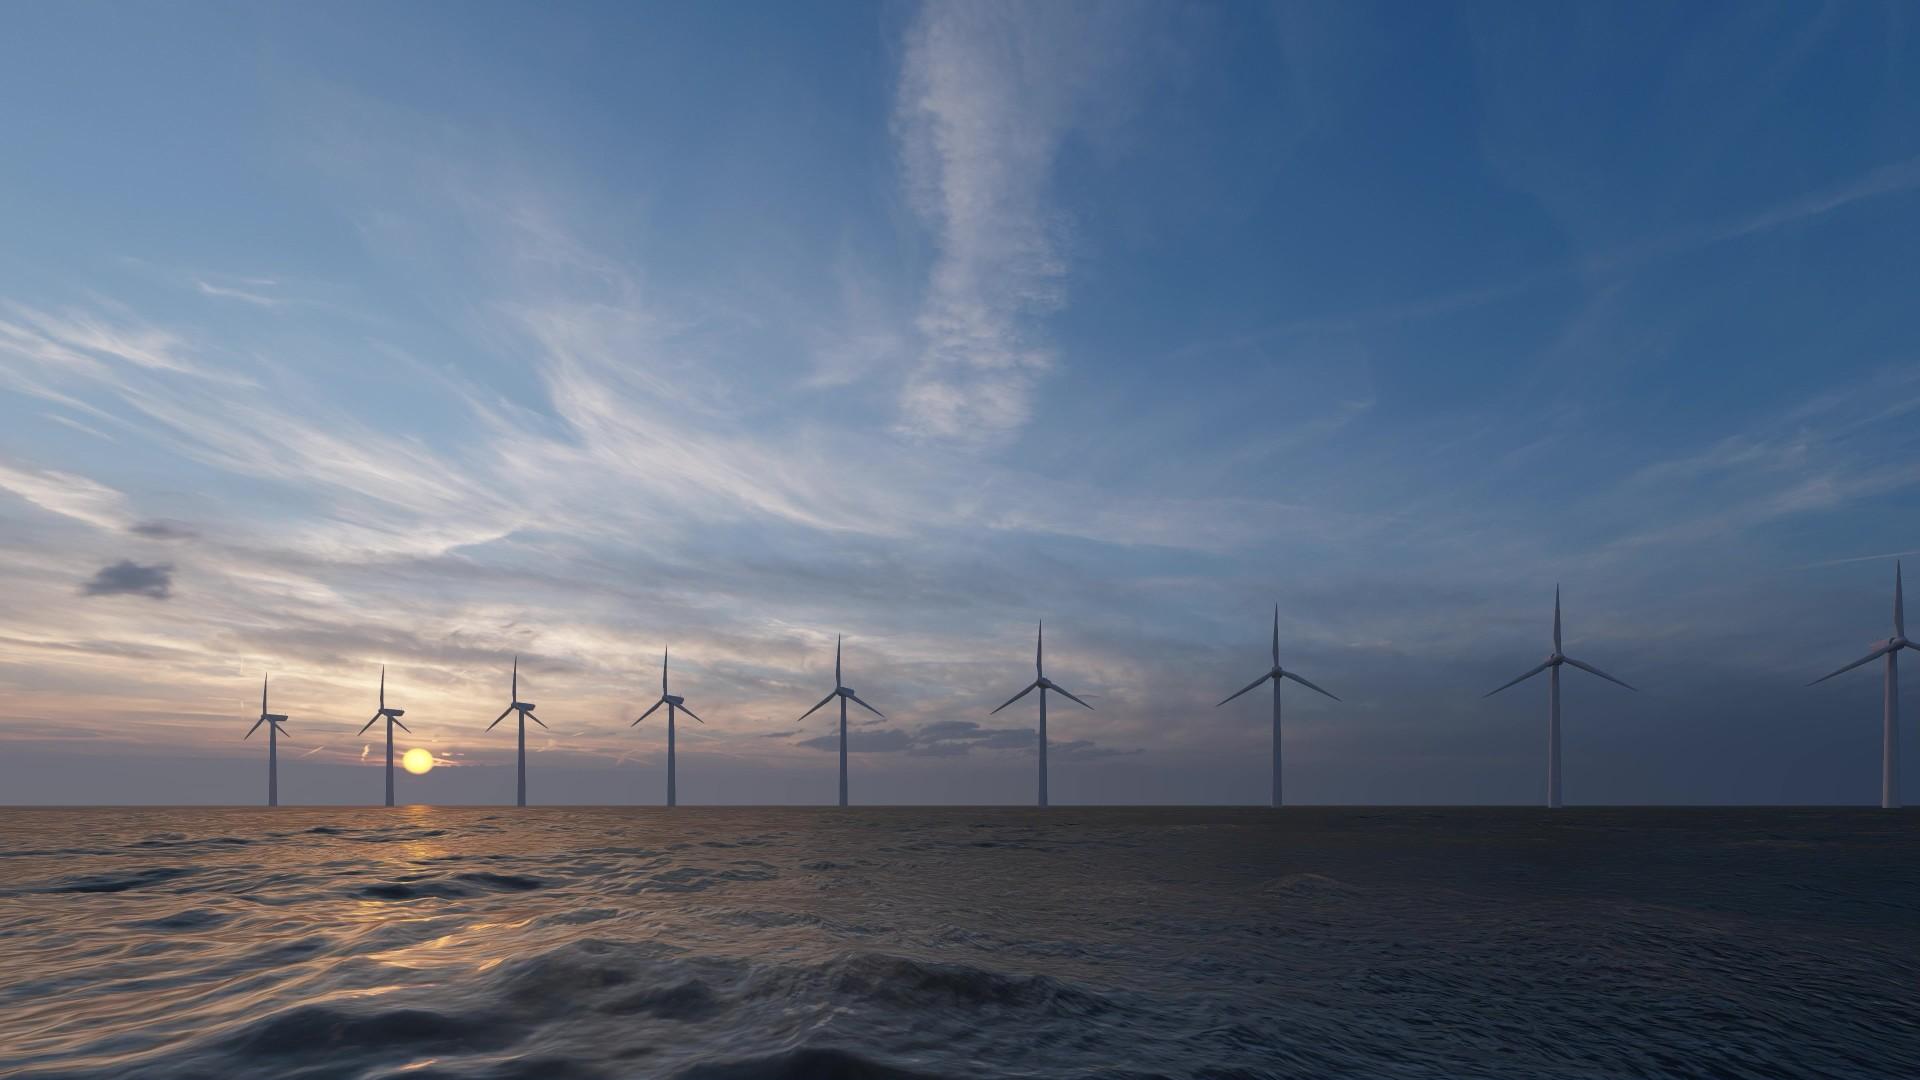 https://watt.co.uk/wp-content/uploads/2020/09/aerial-view-power-energy-alternative-clean-energy-power-electricity-industry-on-sea-aerial-view-green_t20_GJLg7m.jpg